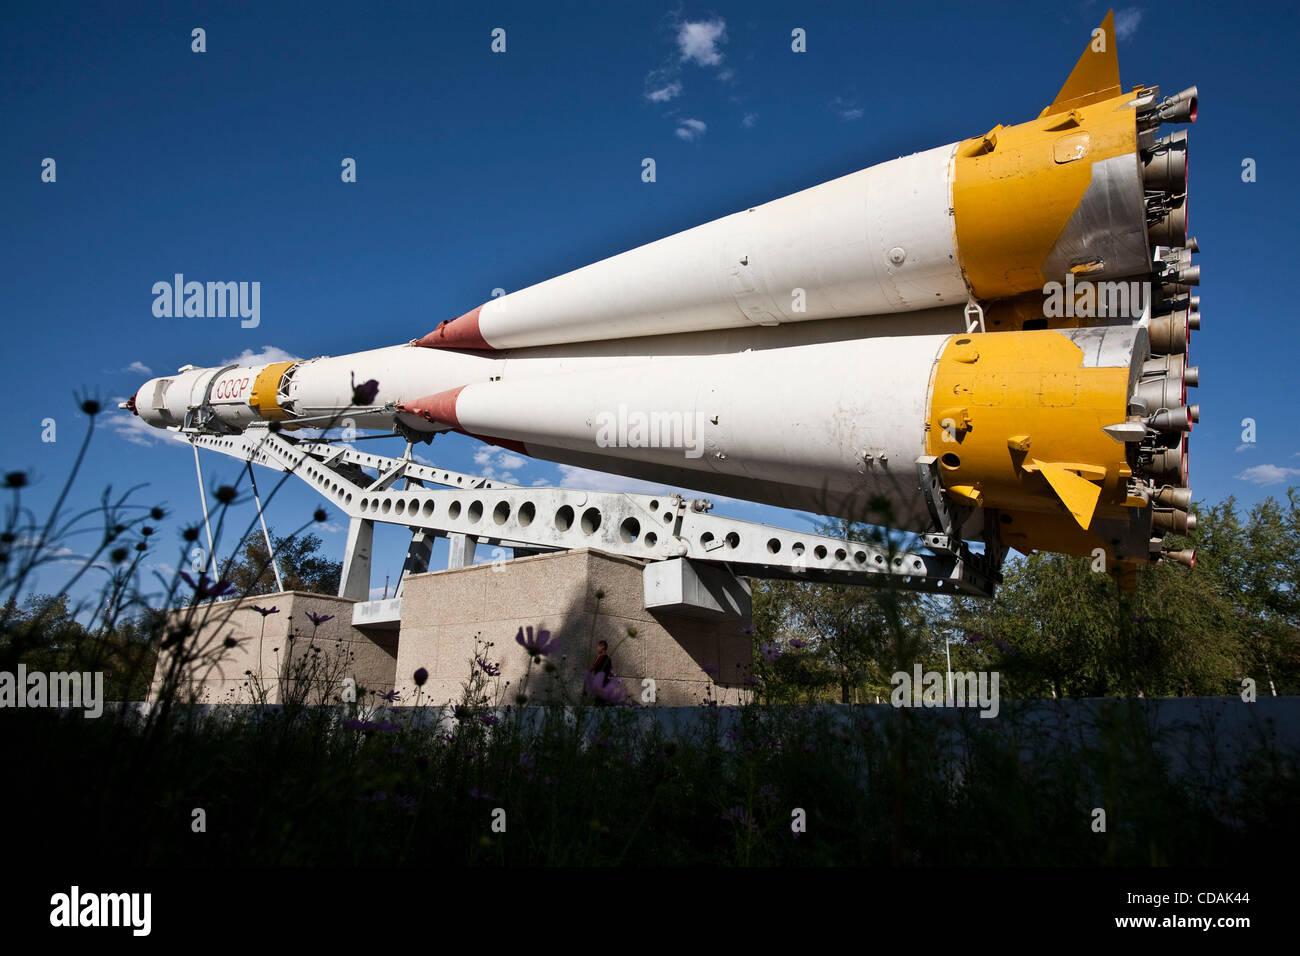 Sep 03, 2010 - Baikonur Cosmodrome, Kazakhstan - Baikonur Cosmodrome. Children play hide-and-seek by the Soyuz rocket - Stock Image